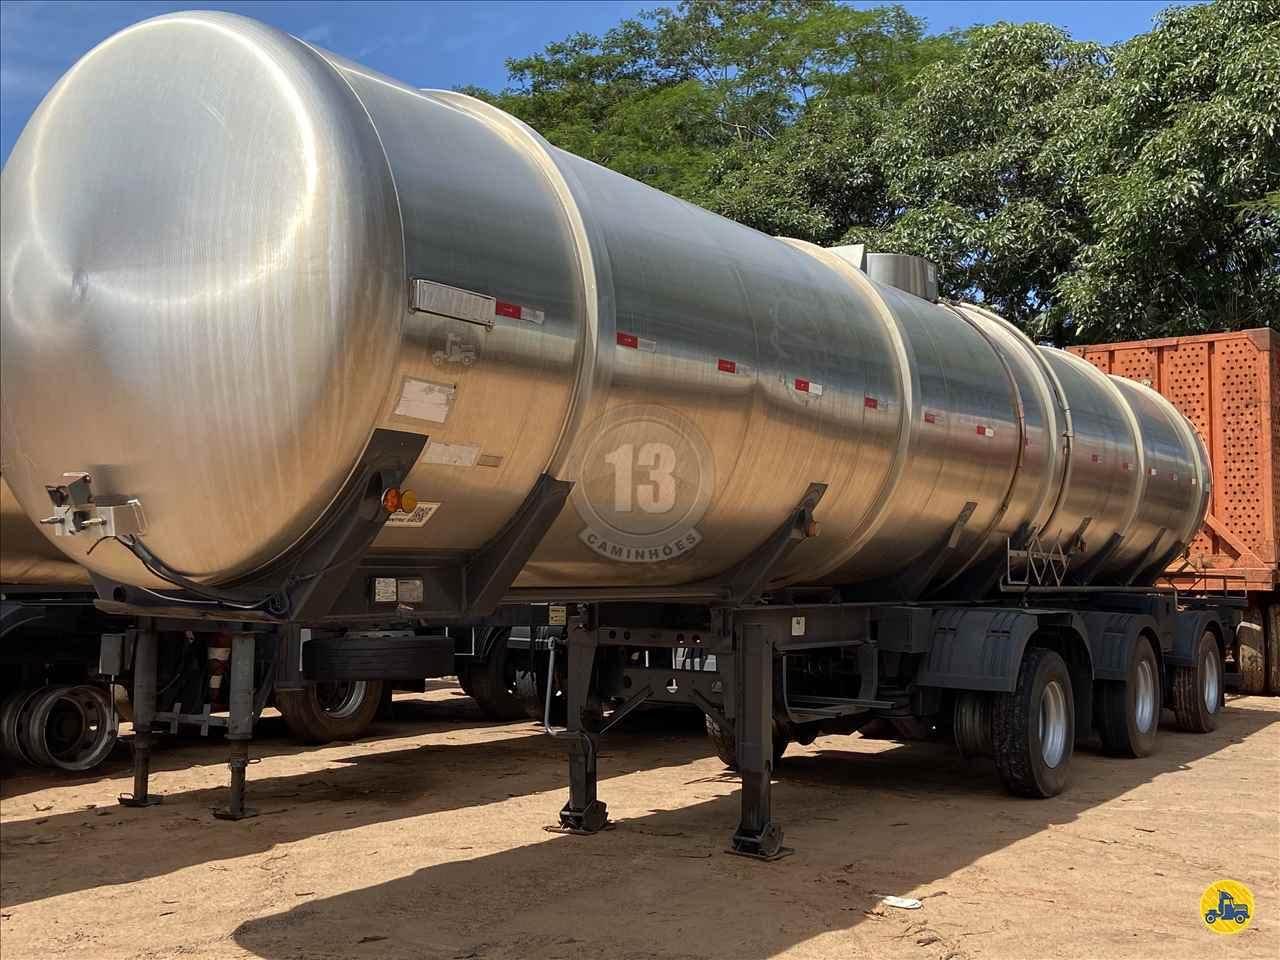 TANQUE INOX de 13 Caminhões - ARACATUBA/SP